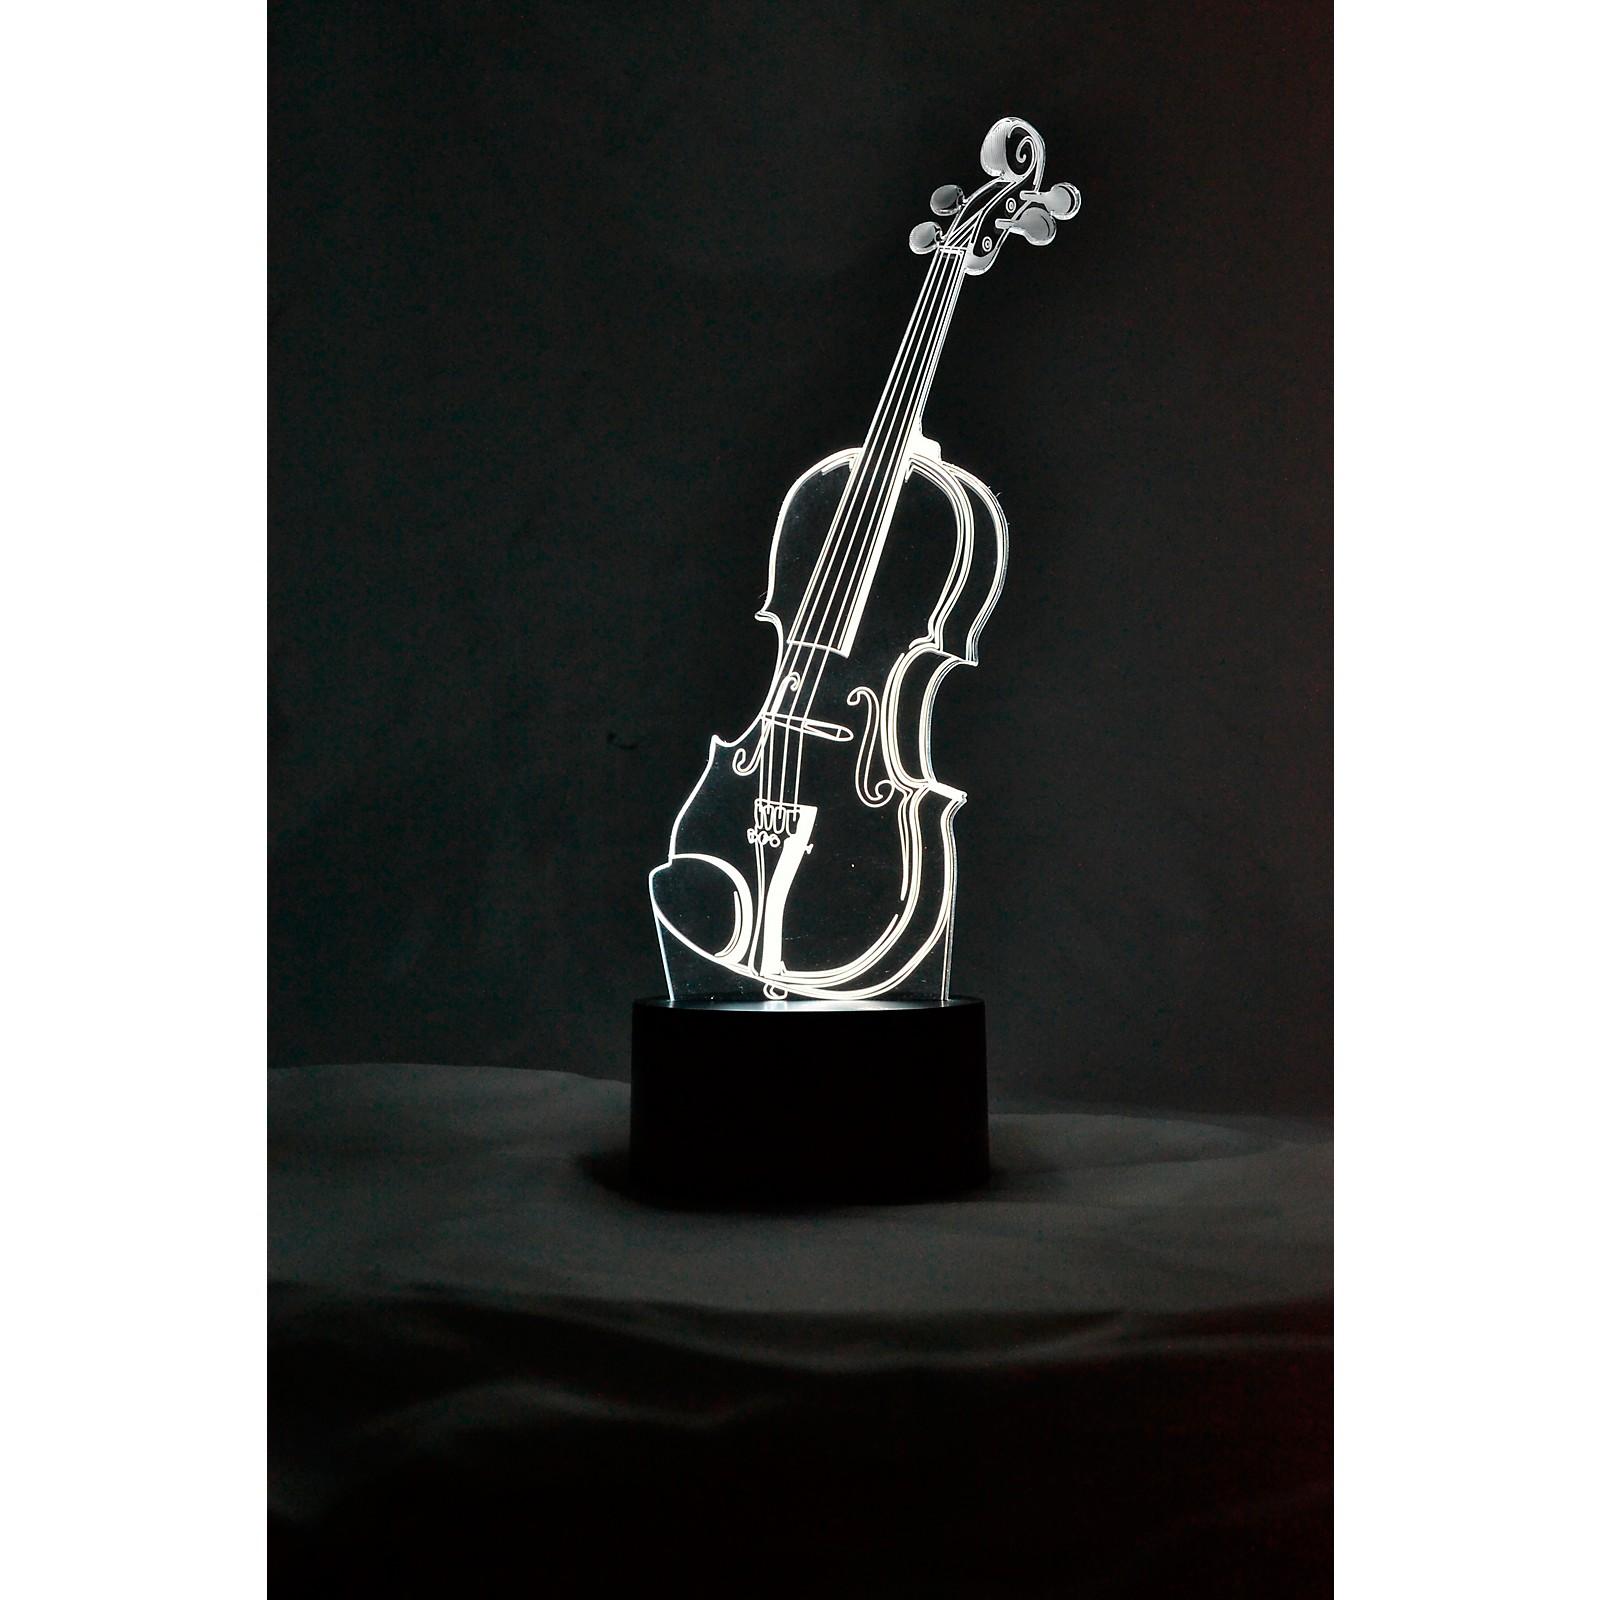 AIM Violin 3D LED Lamp Optical Illusion Light